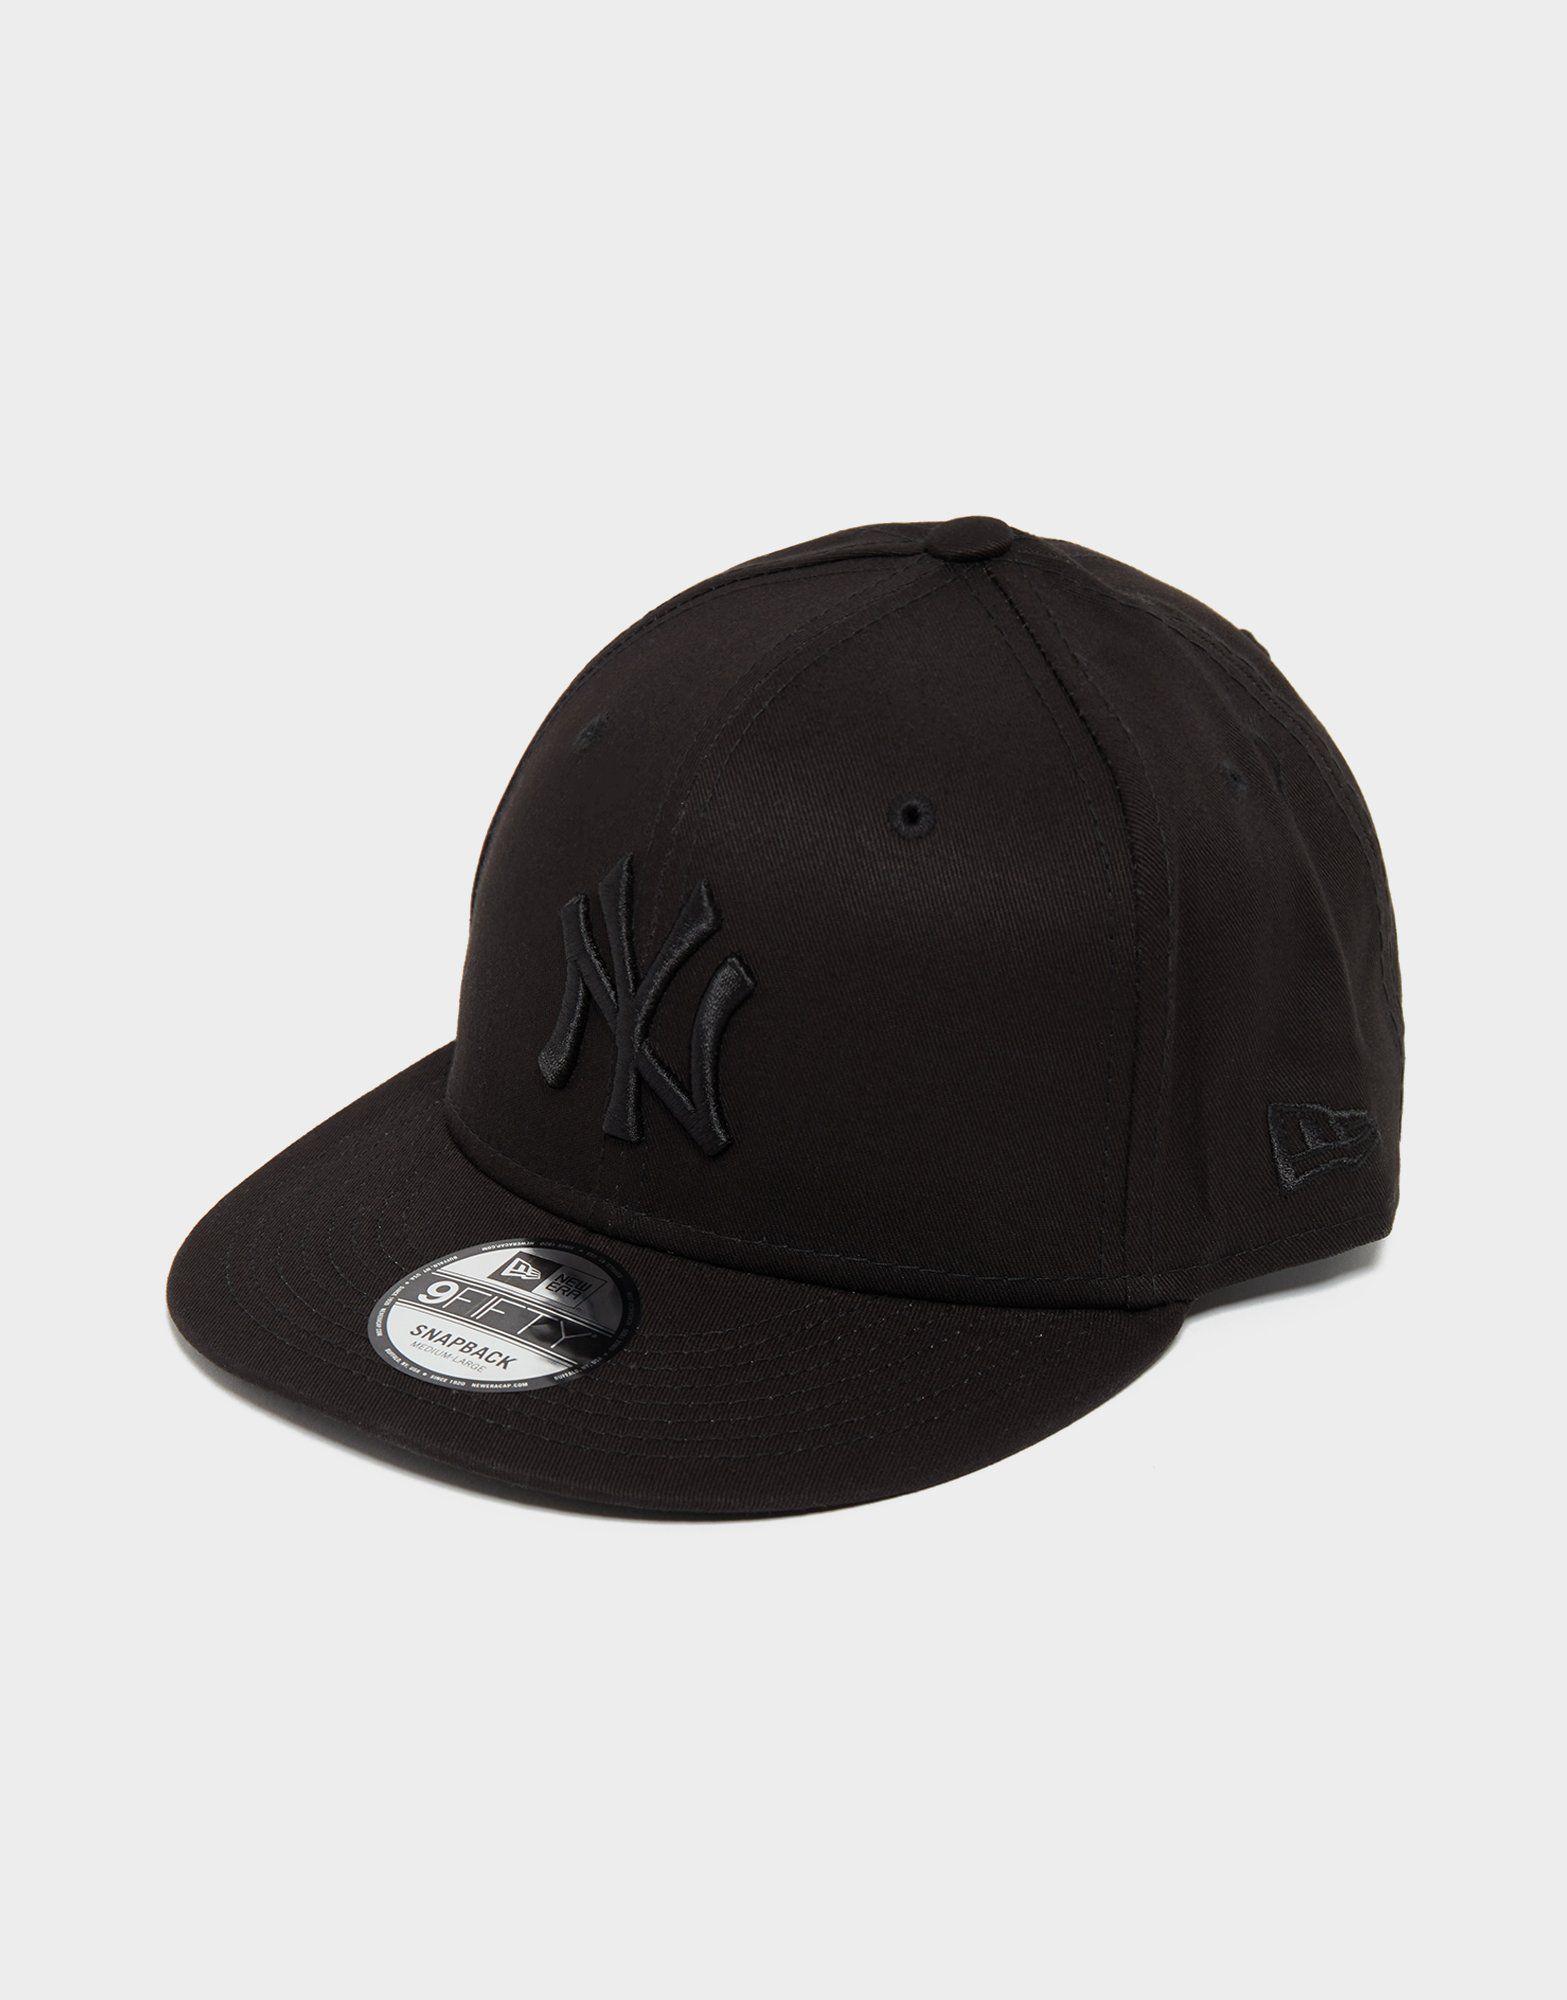 28d2255b53e New Era MLB New York Yankees 9FIFTY Snapback Cap